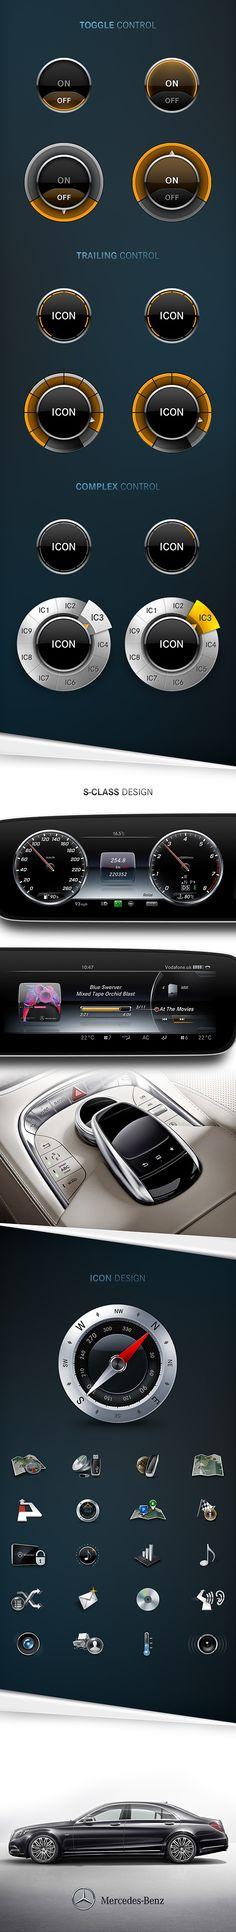 Mercedes-Benz UI/UX by Denny Moritz, via Behance